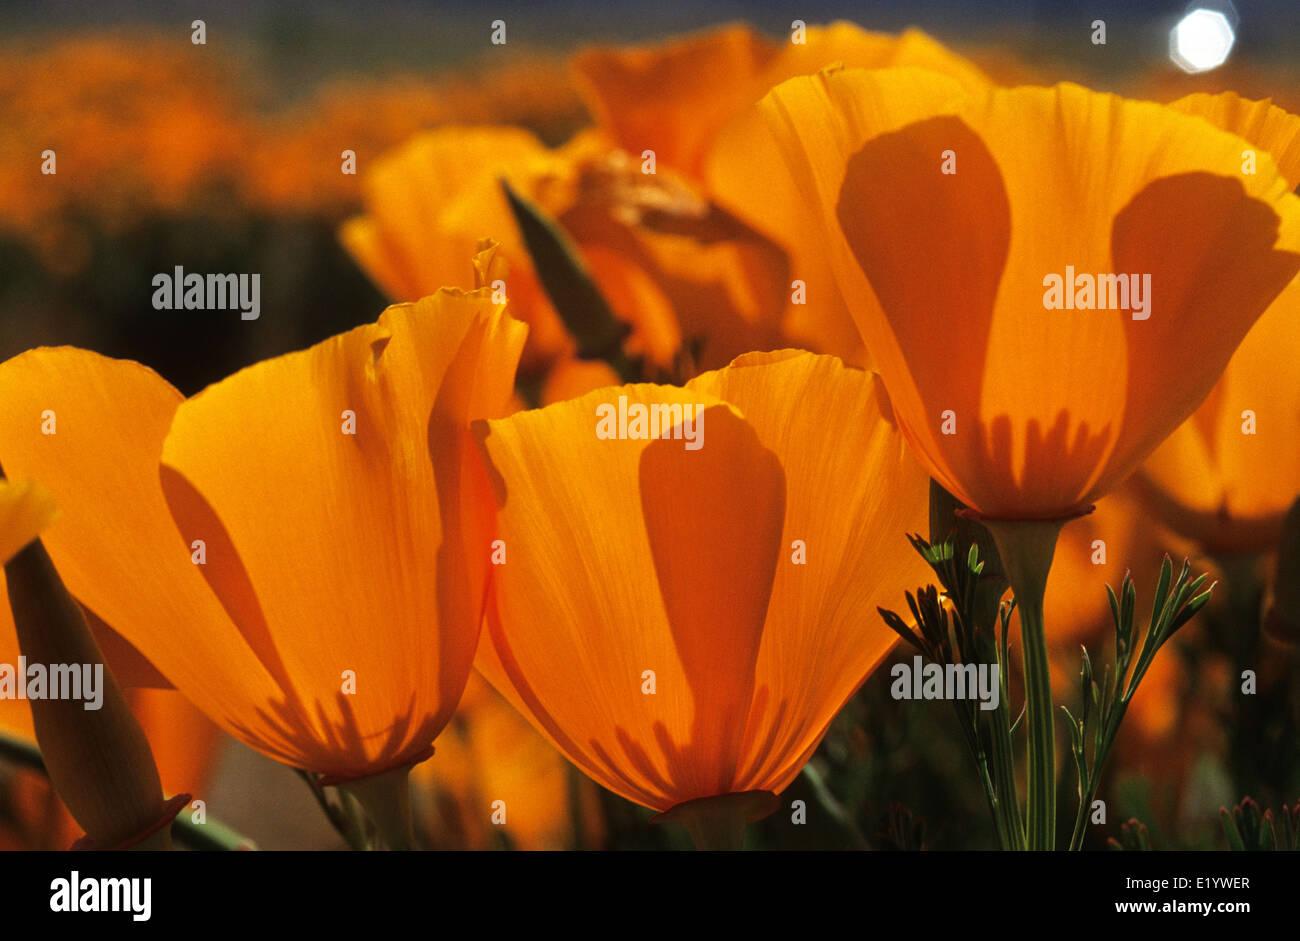 Elk248-3098 California, Antelope Valley California Poppy Preserve, California poppies - Stock Image